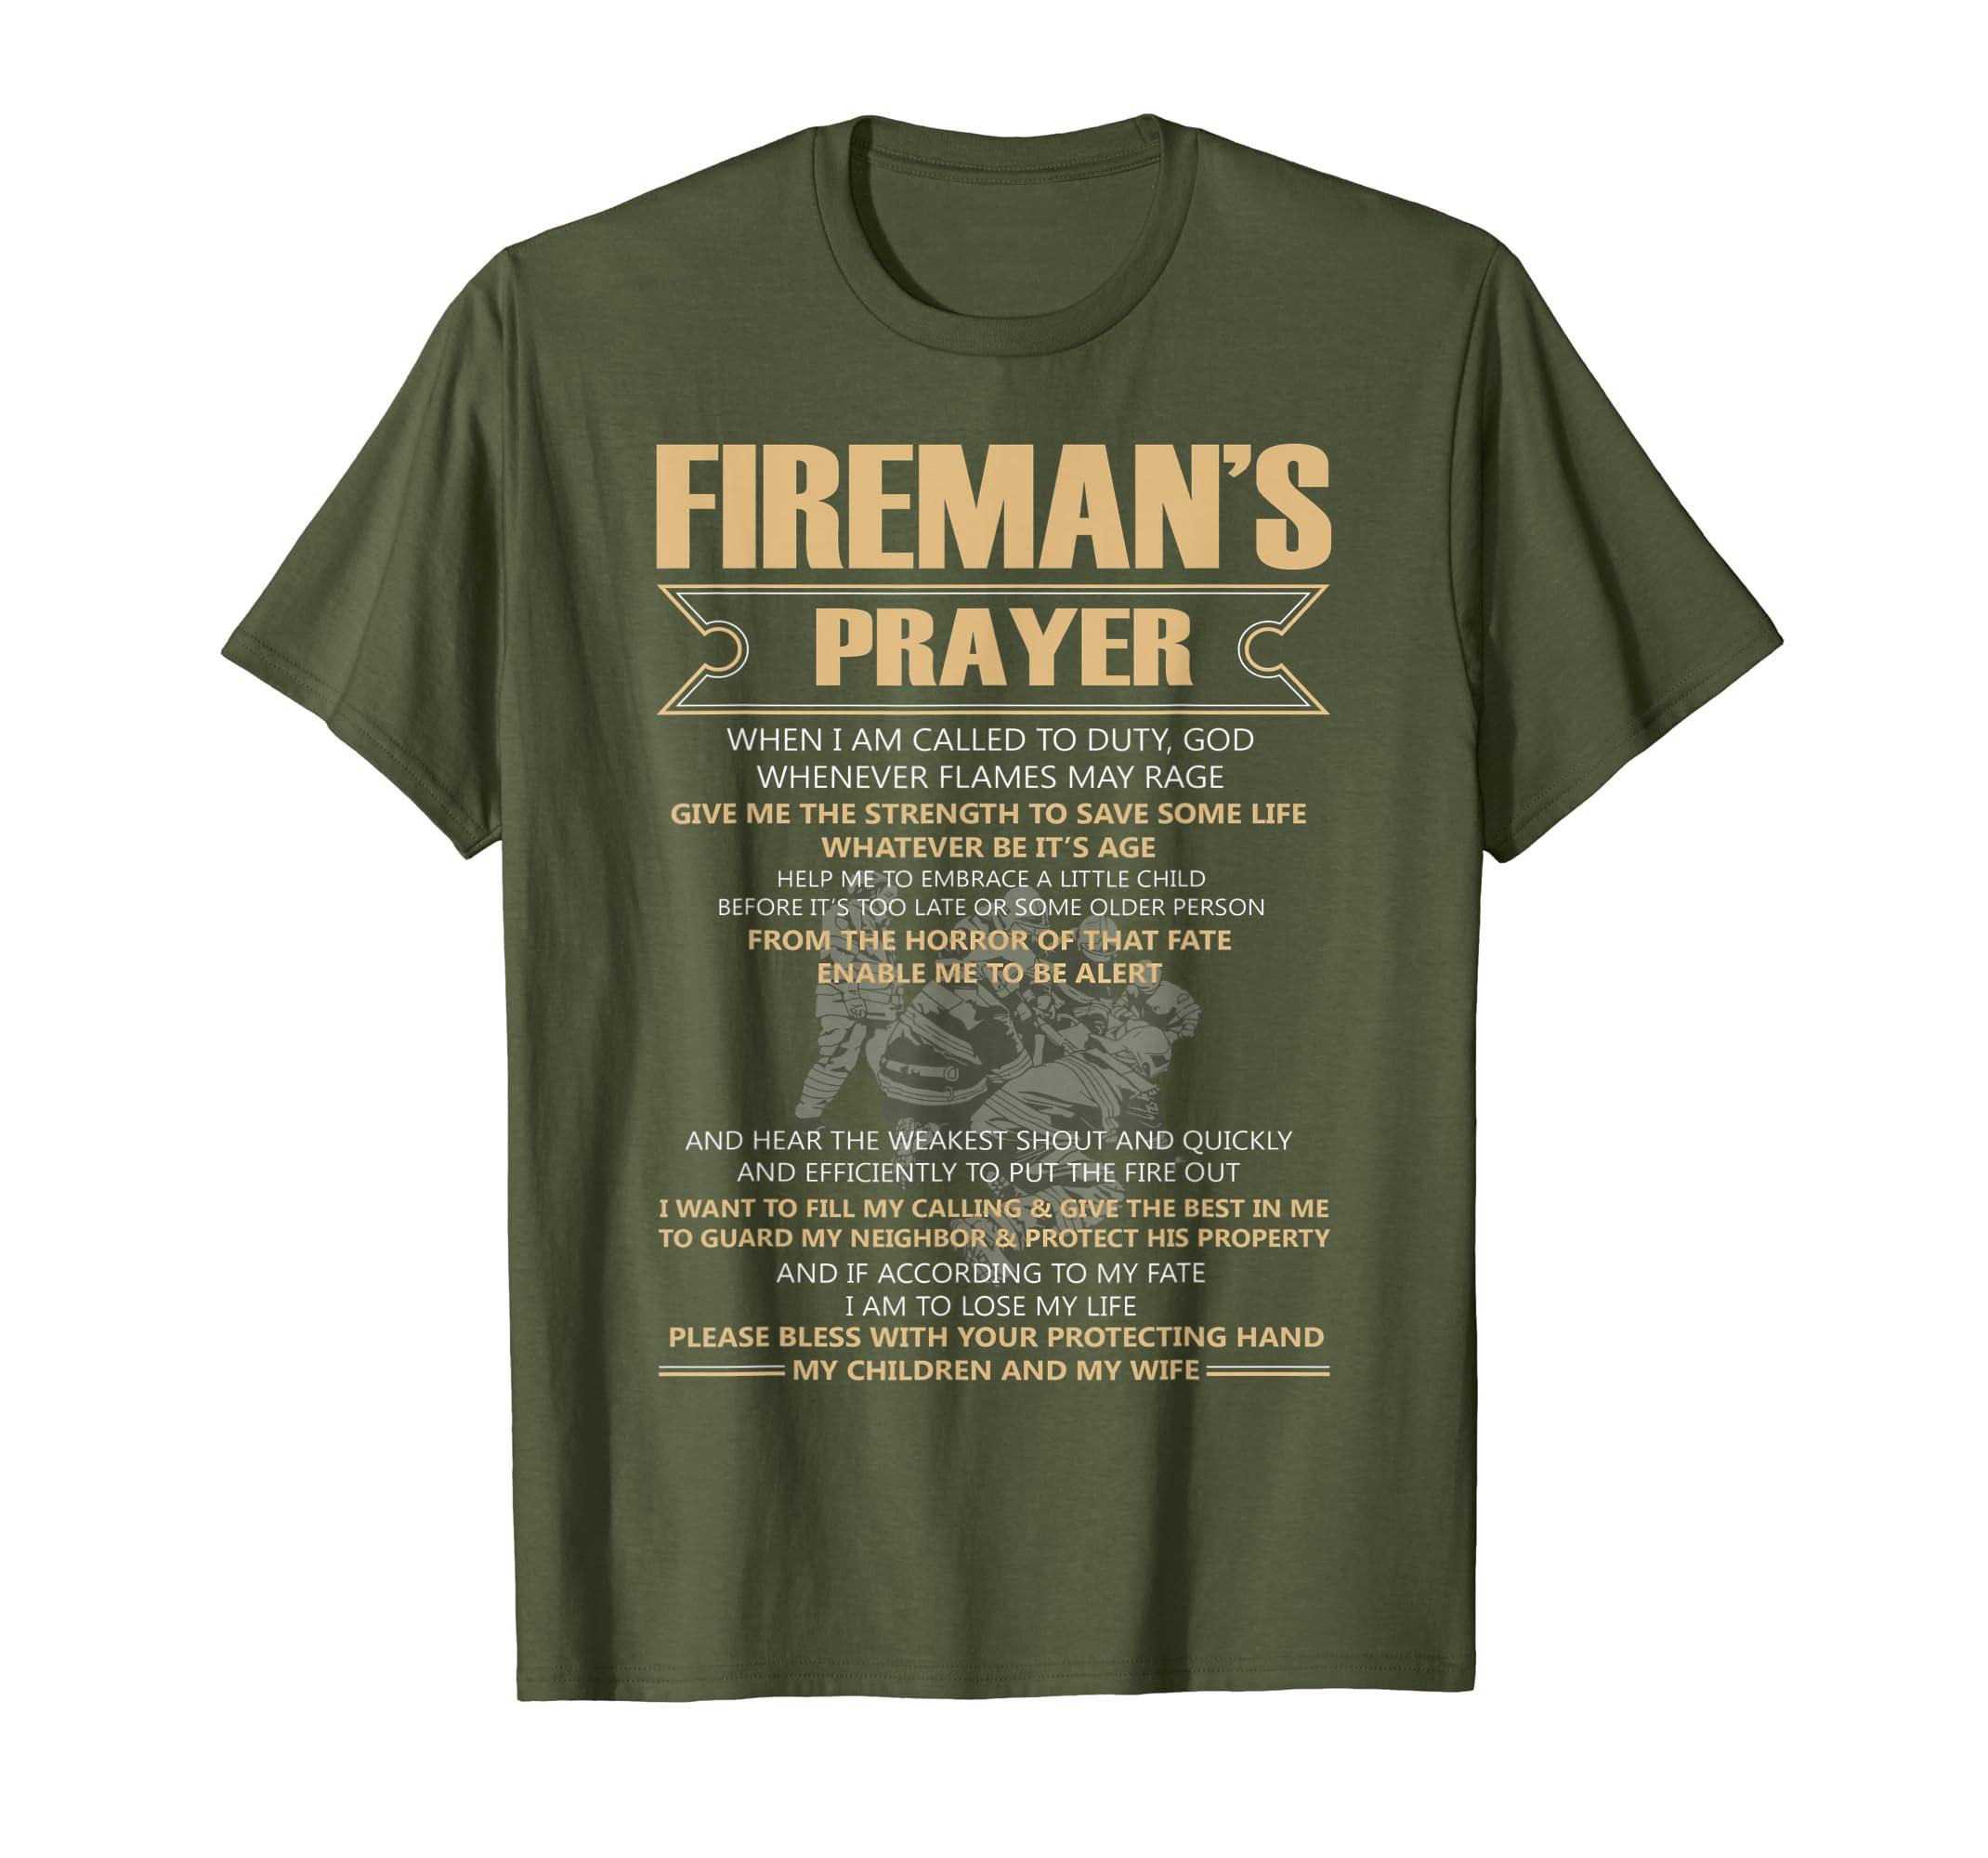 Amazon com: Firefighter's Prayer T Shirt, My Children And My Wife